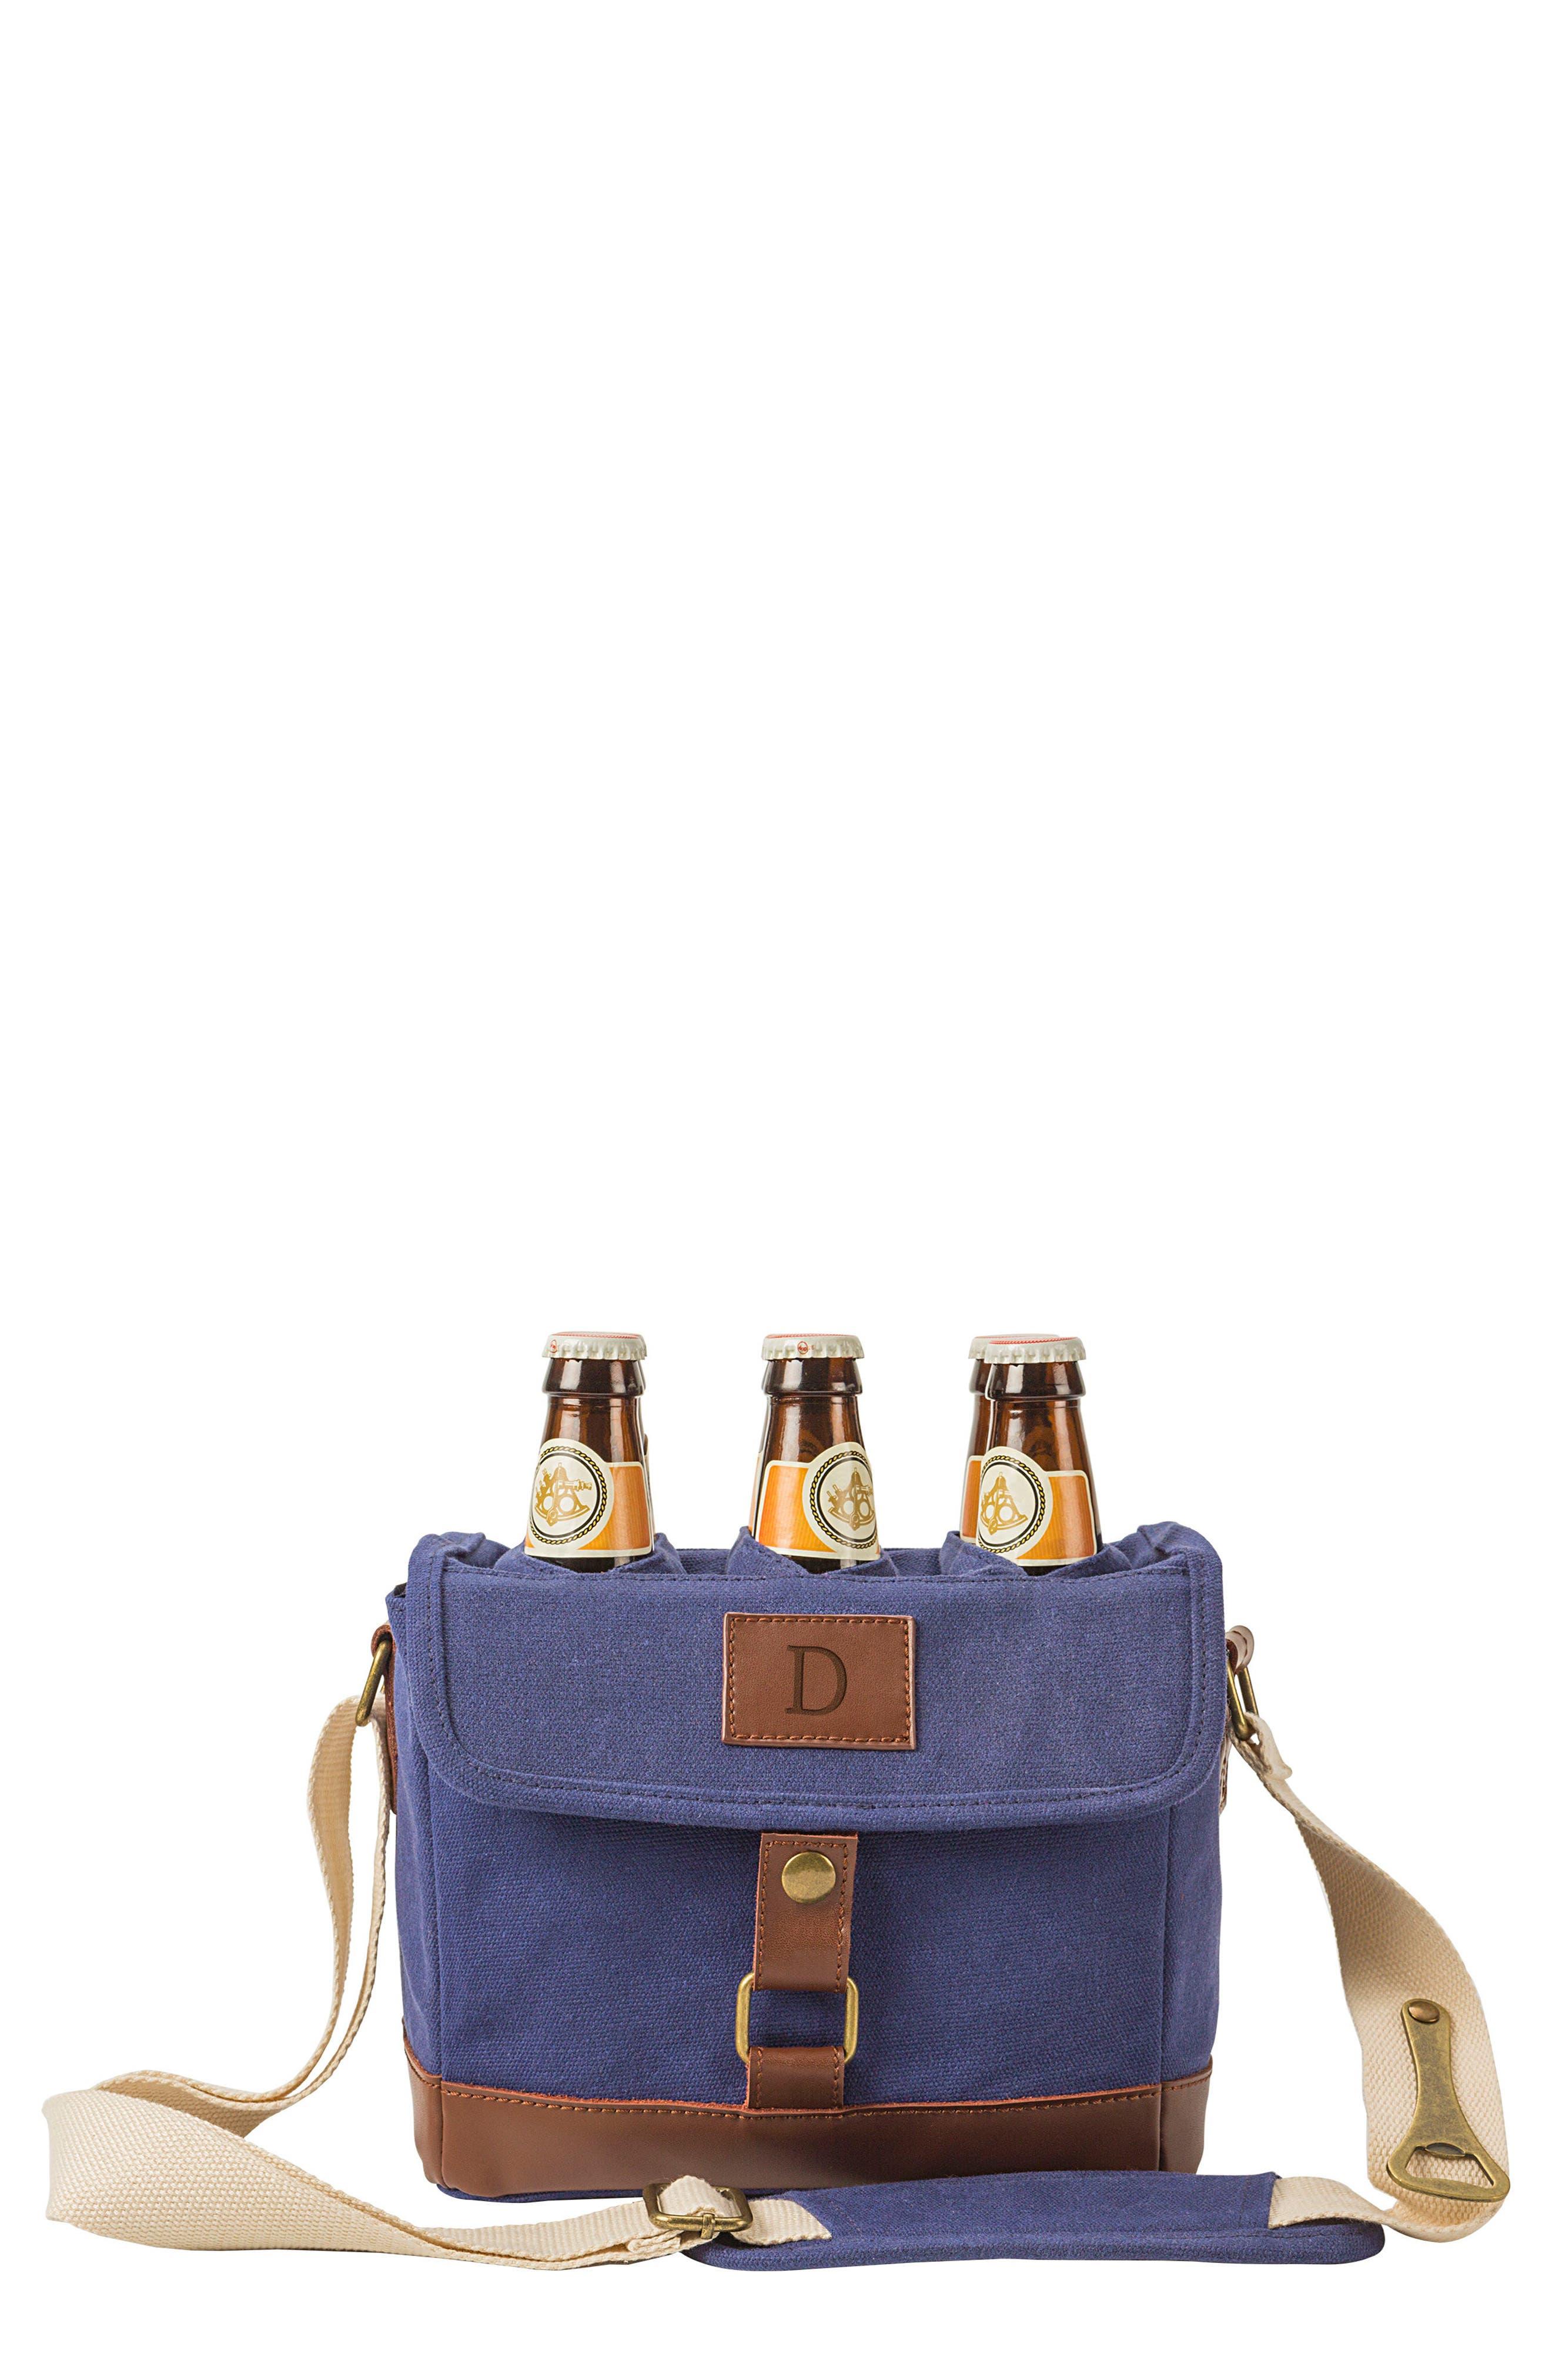 Monogram 6-Bottle Beer Cooler,                             Main thumbnail 1, color,                             BLUE-D